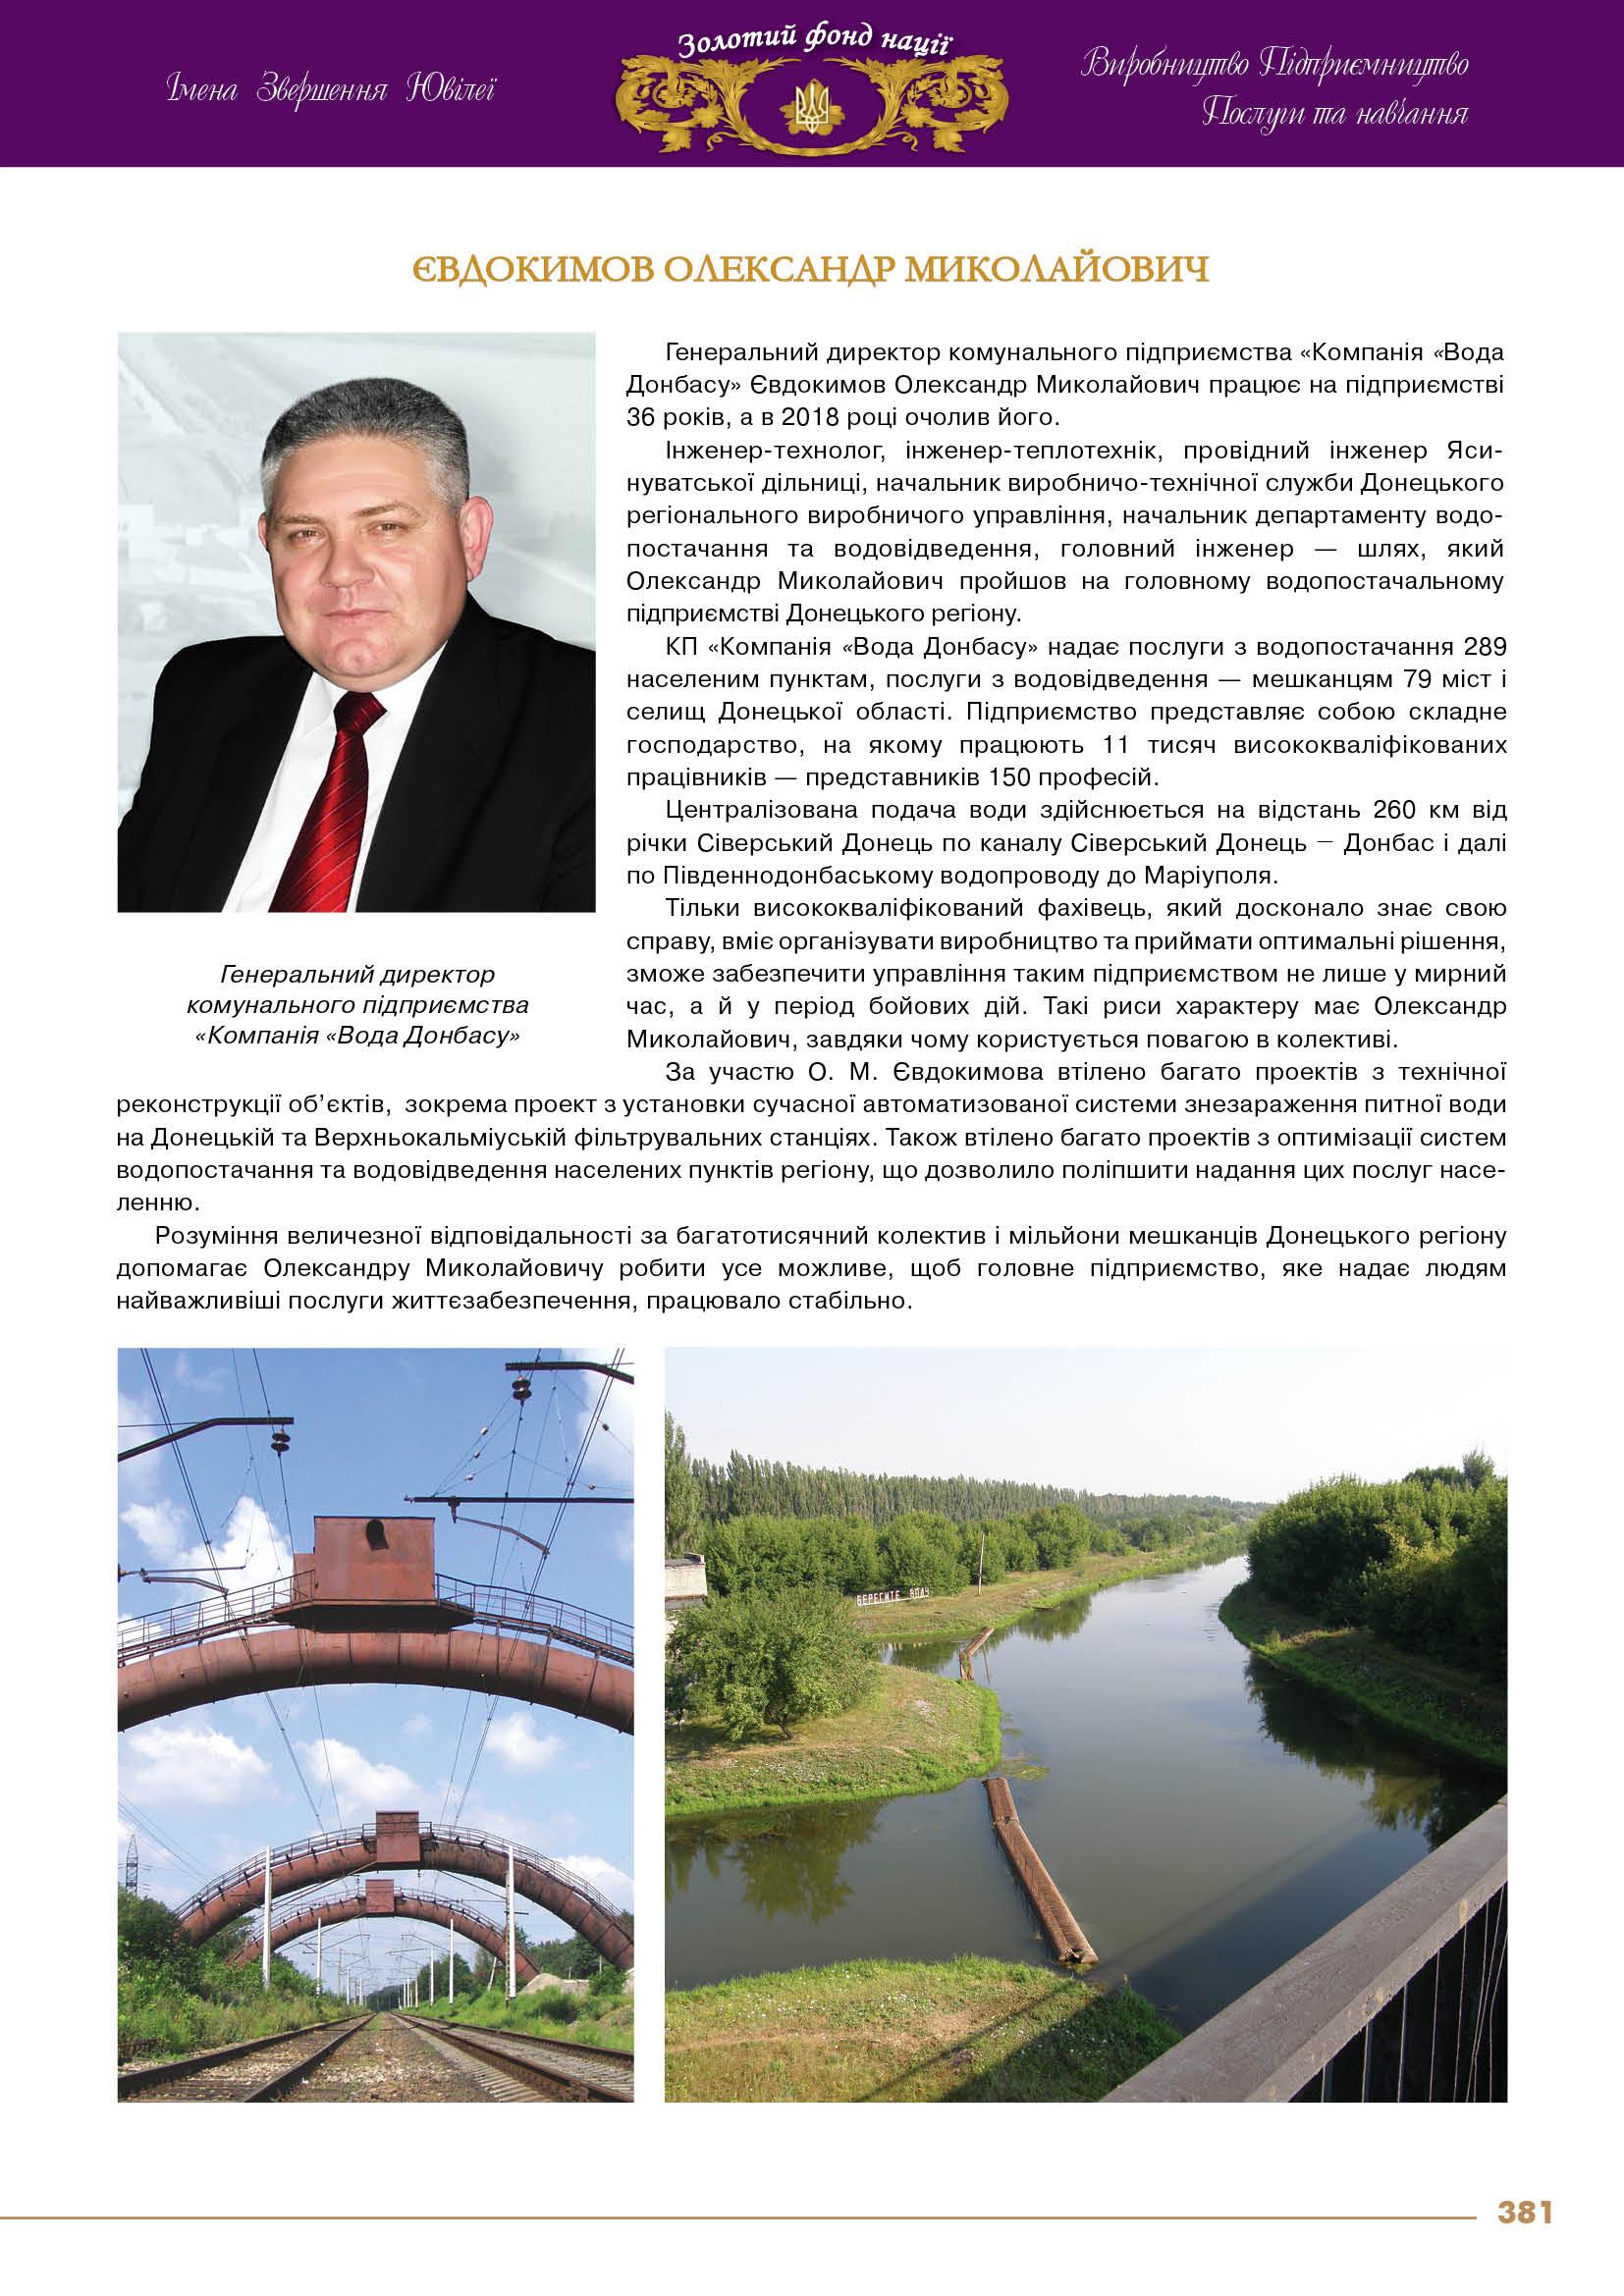 Євдокимов Олександр Миколайович